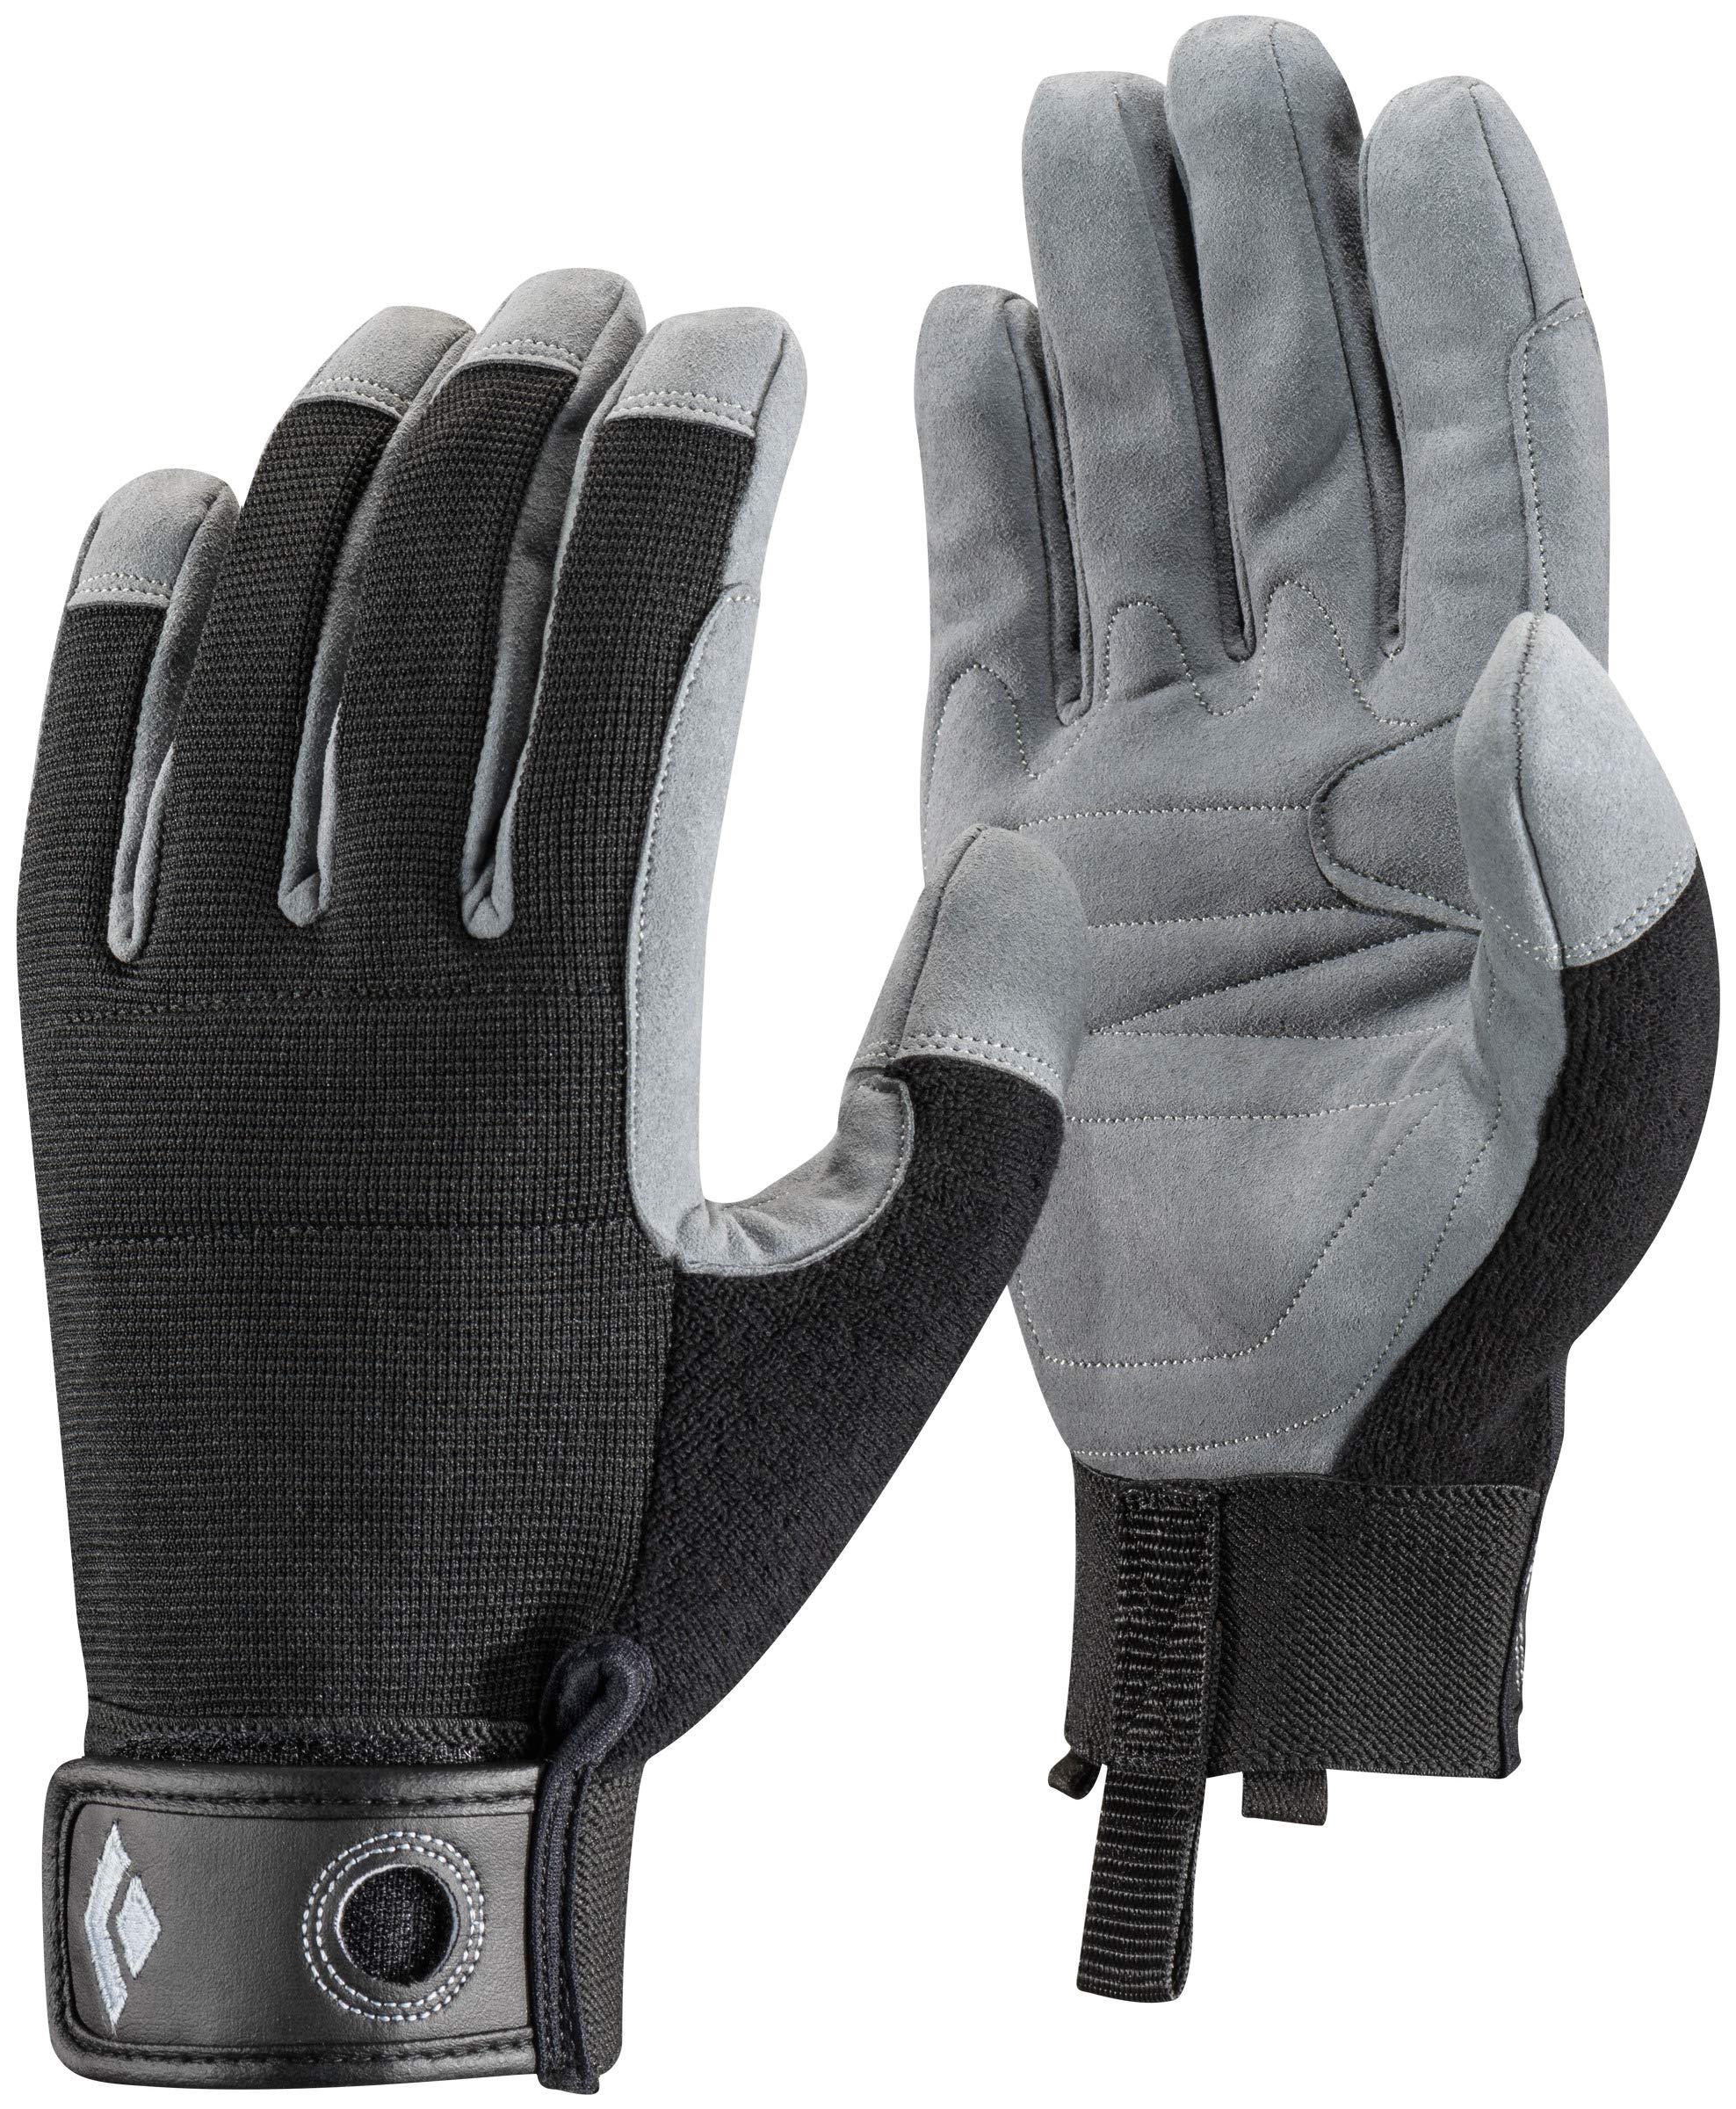 Black Diamond Crag Climbing Gloves, Black, Medium by Black Diamond